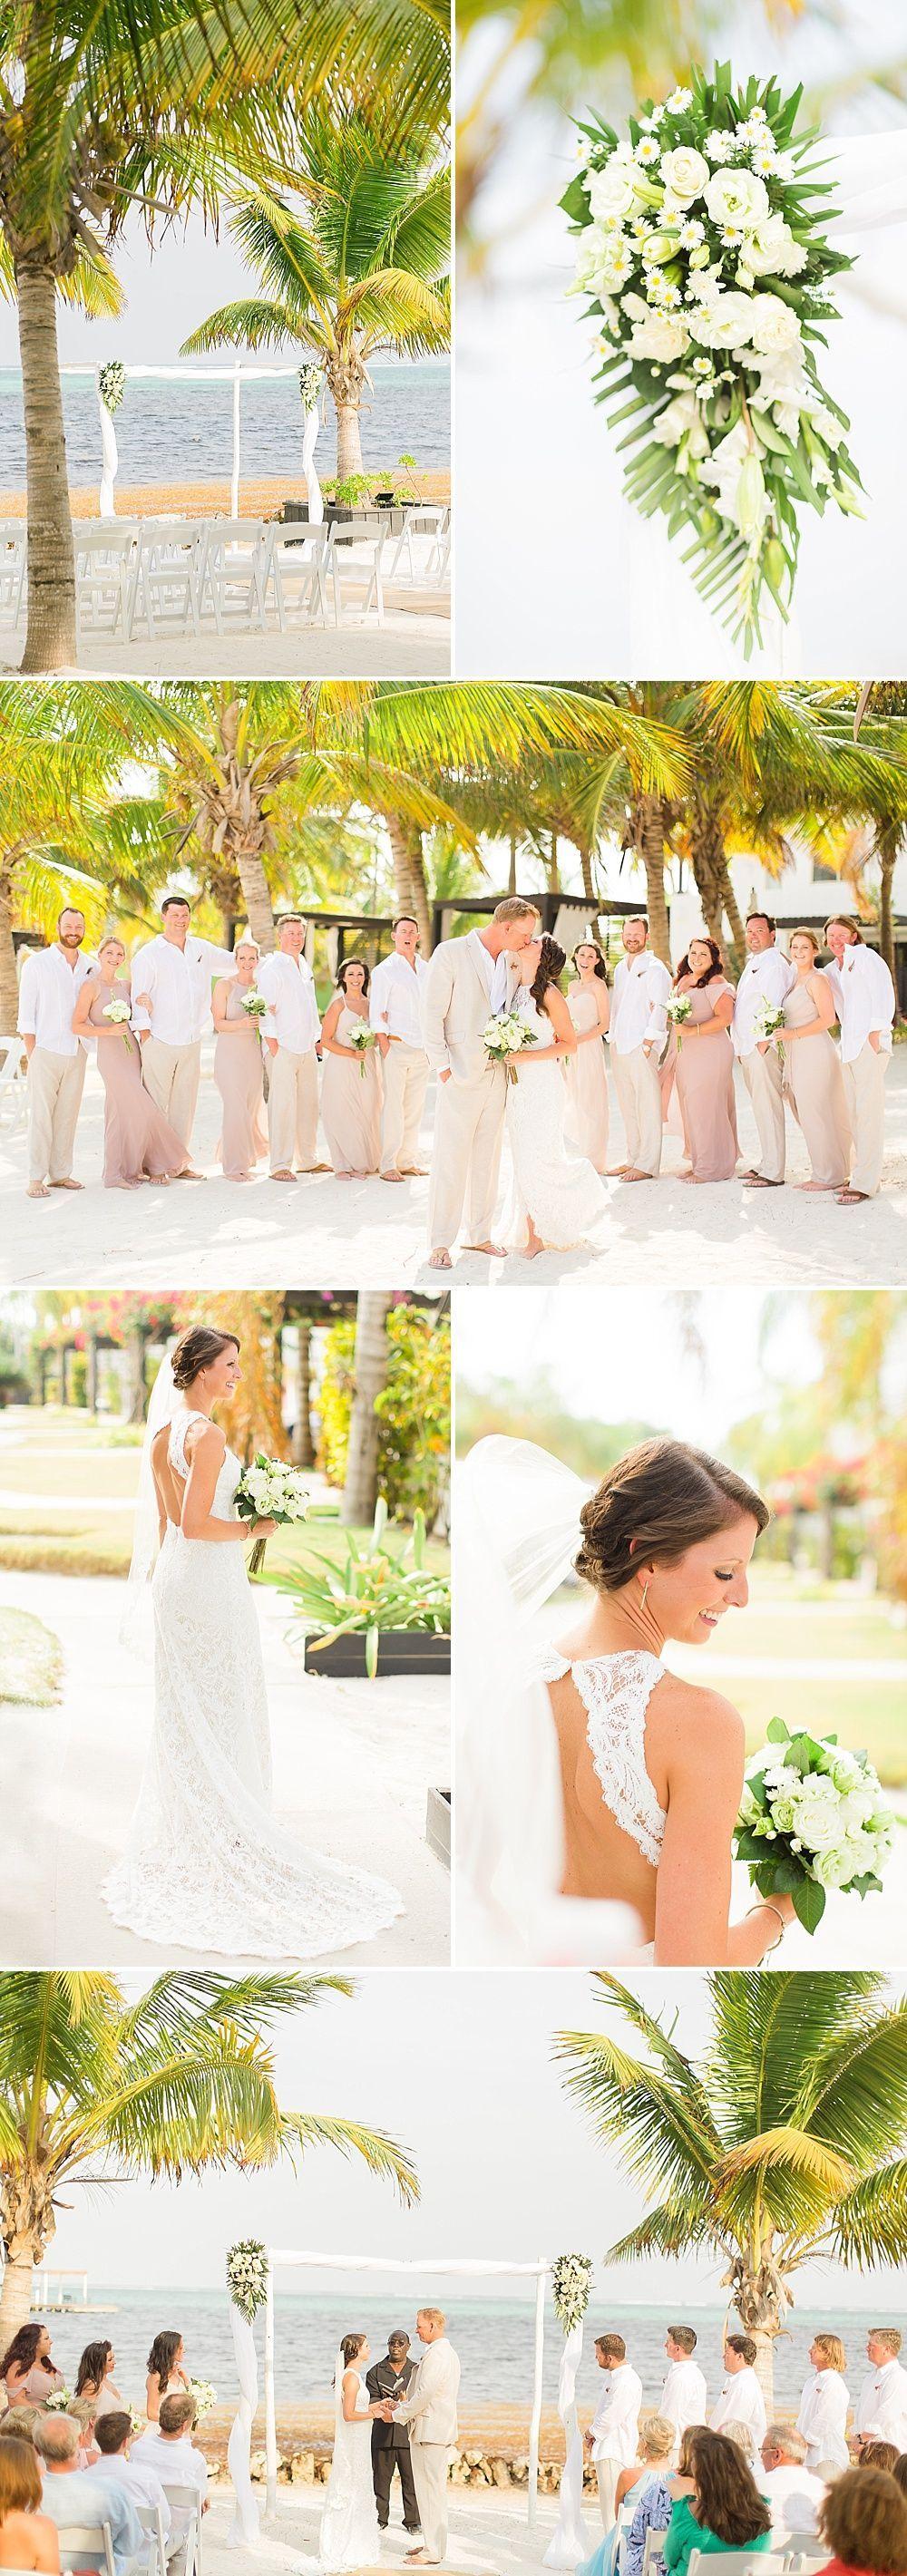 Las Terrazas Belize Wedding | Pinterest | Wedding reception flowers ...